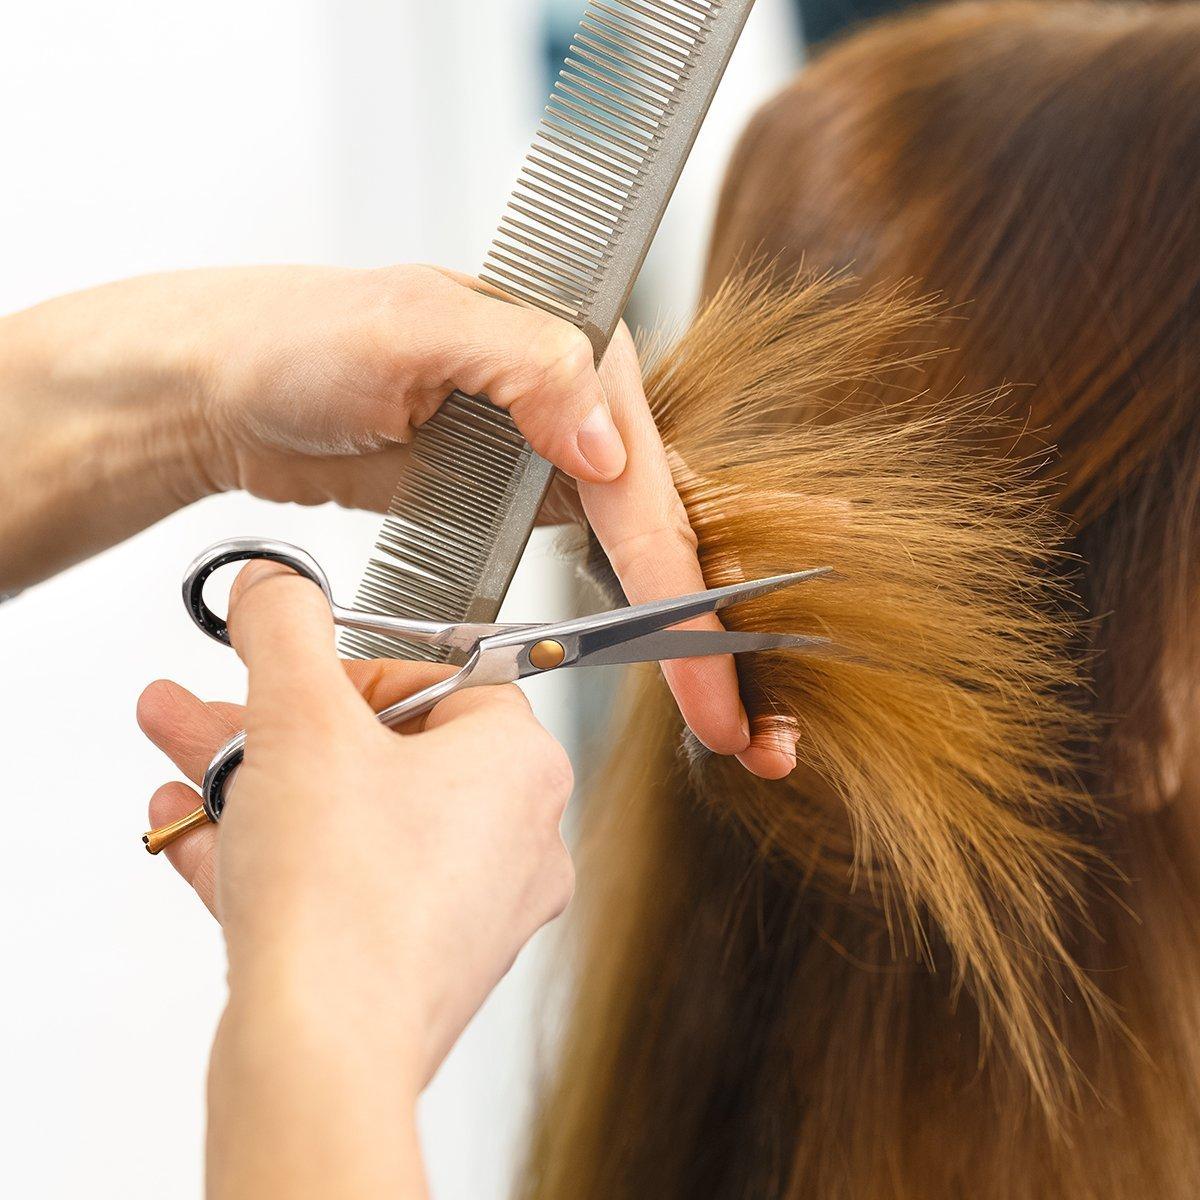 Professional BarberSalon Razor Edge Hair Cutting ScissorsShears 6  Inch Forged with Fine Adjustable